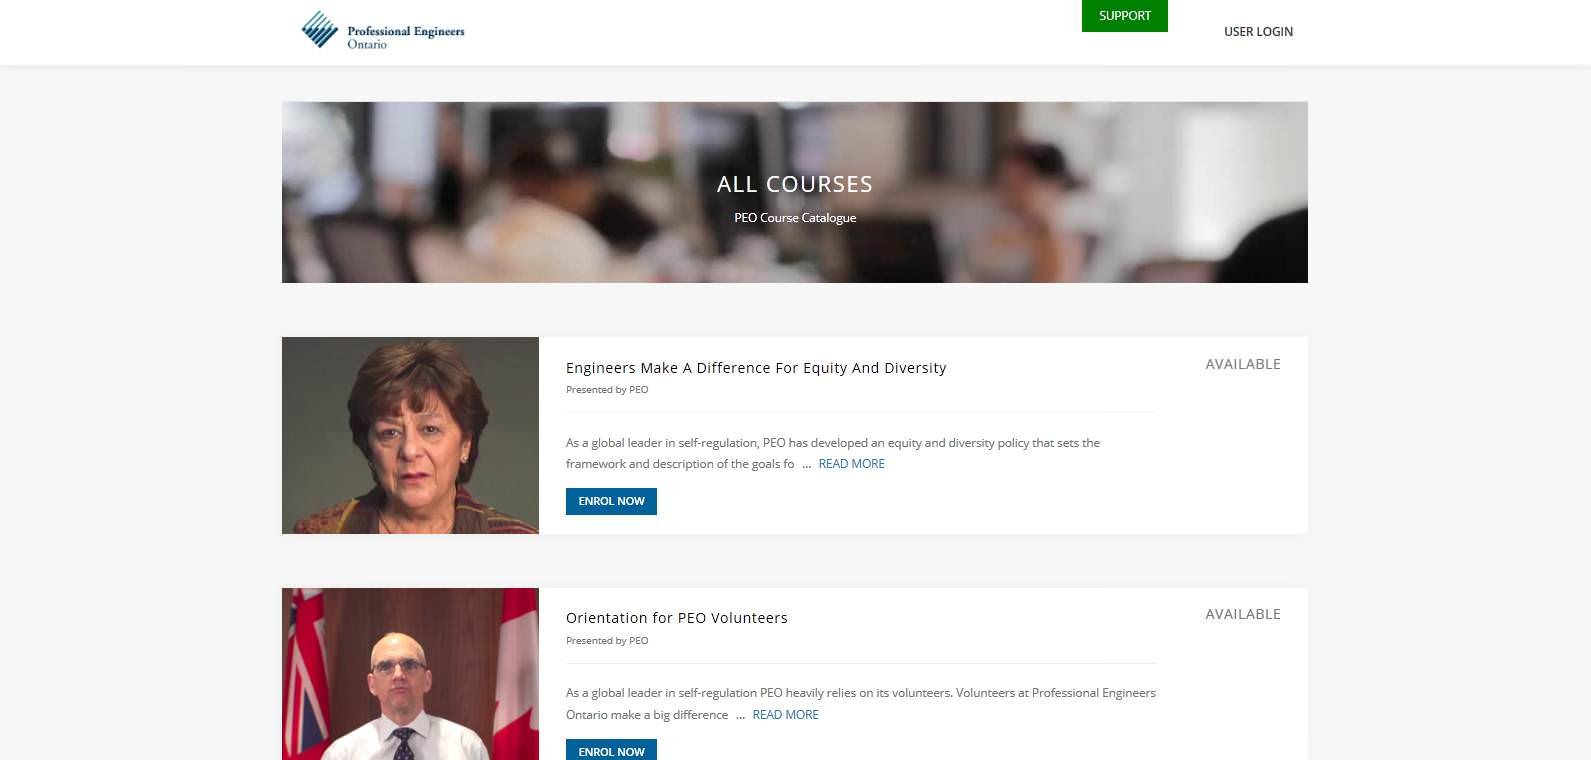 Professional_Engineers_Ontario_Courses